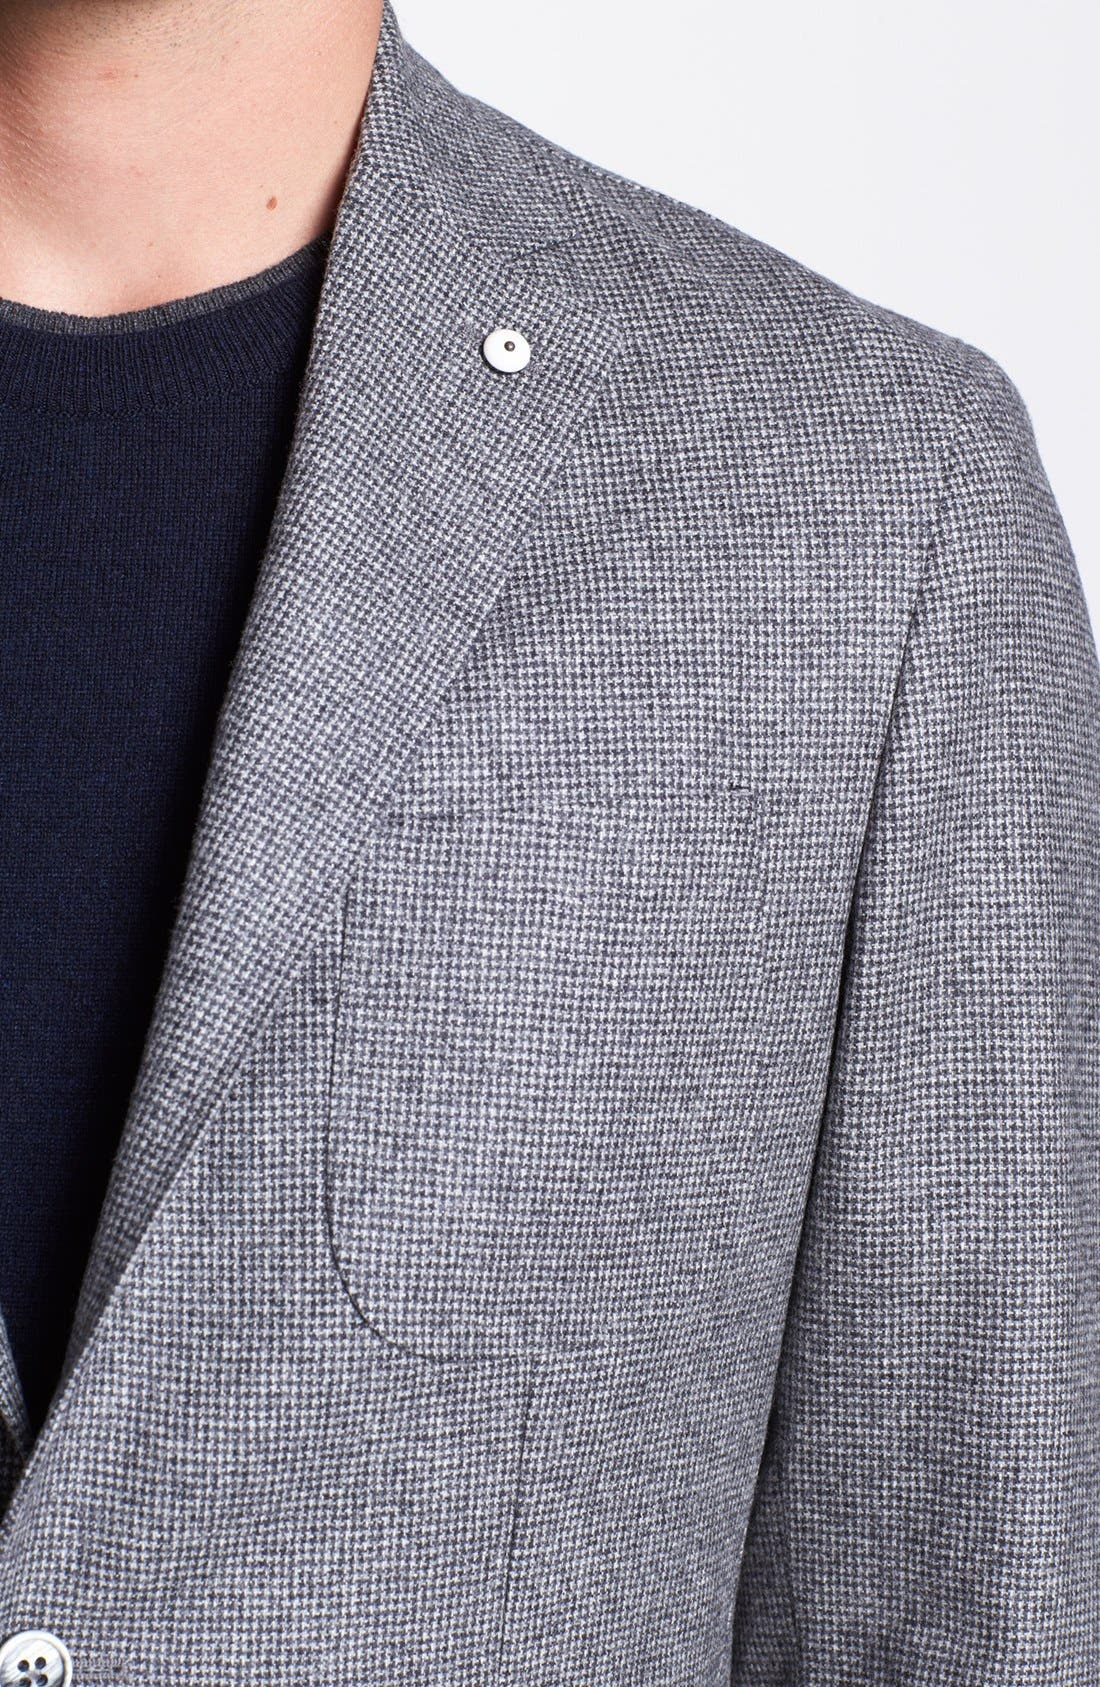 Alternate Image 2  - Lubian Houndstooth Flannel Wool Sportcoat